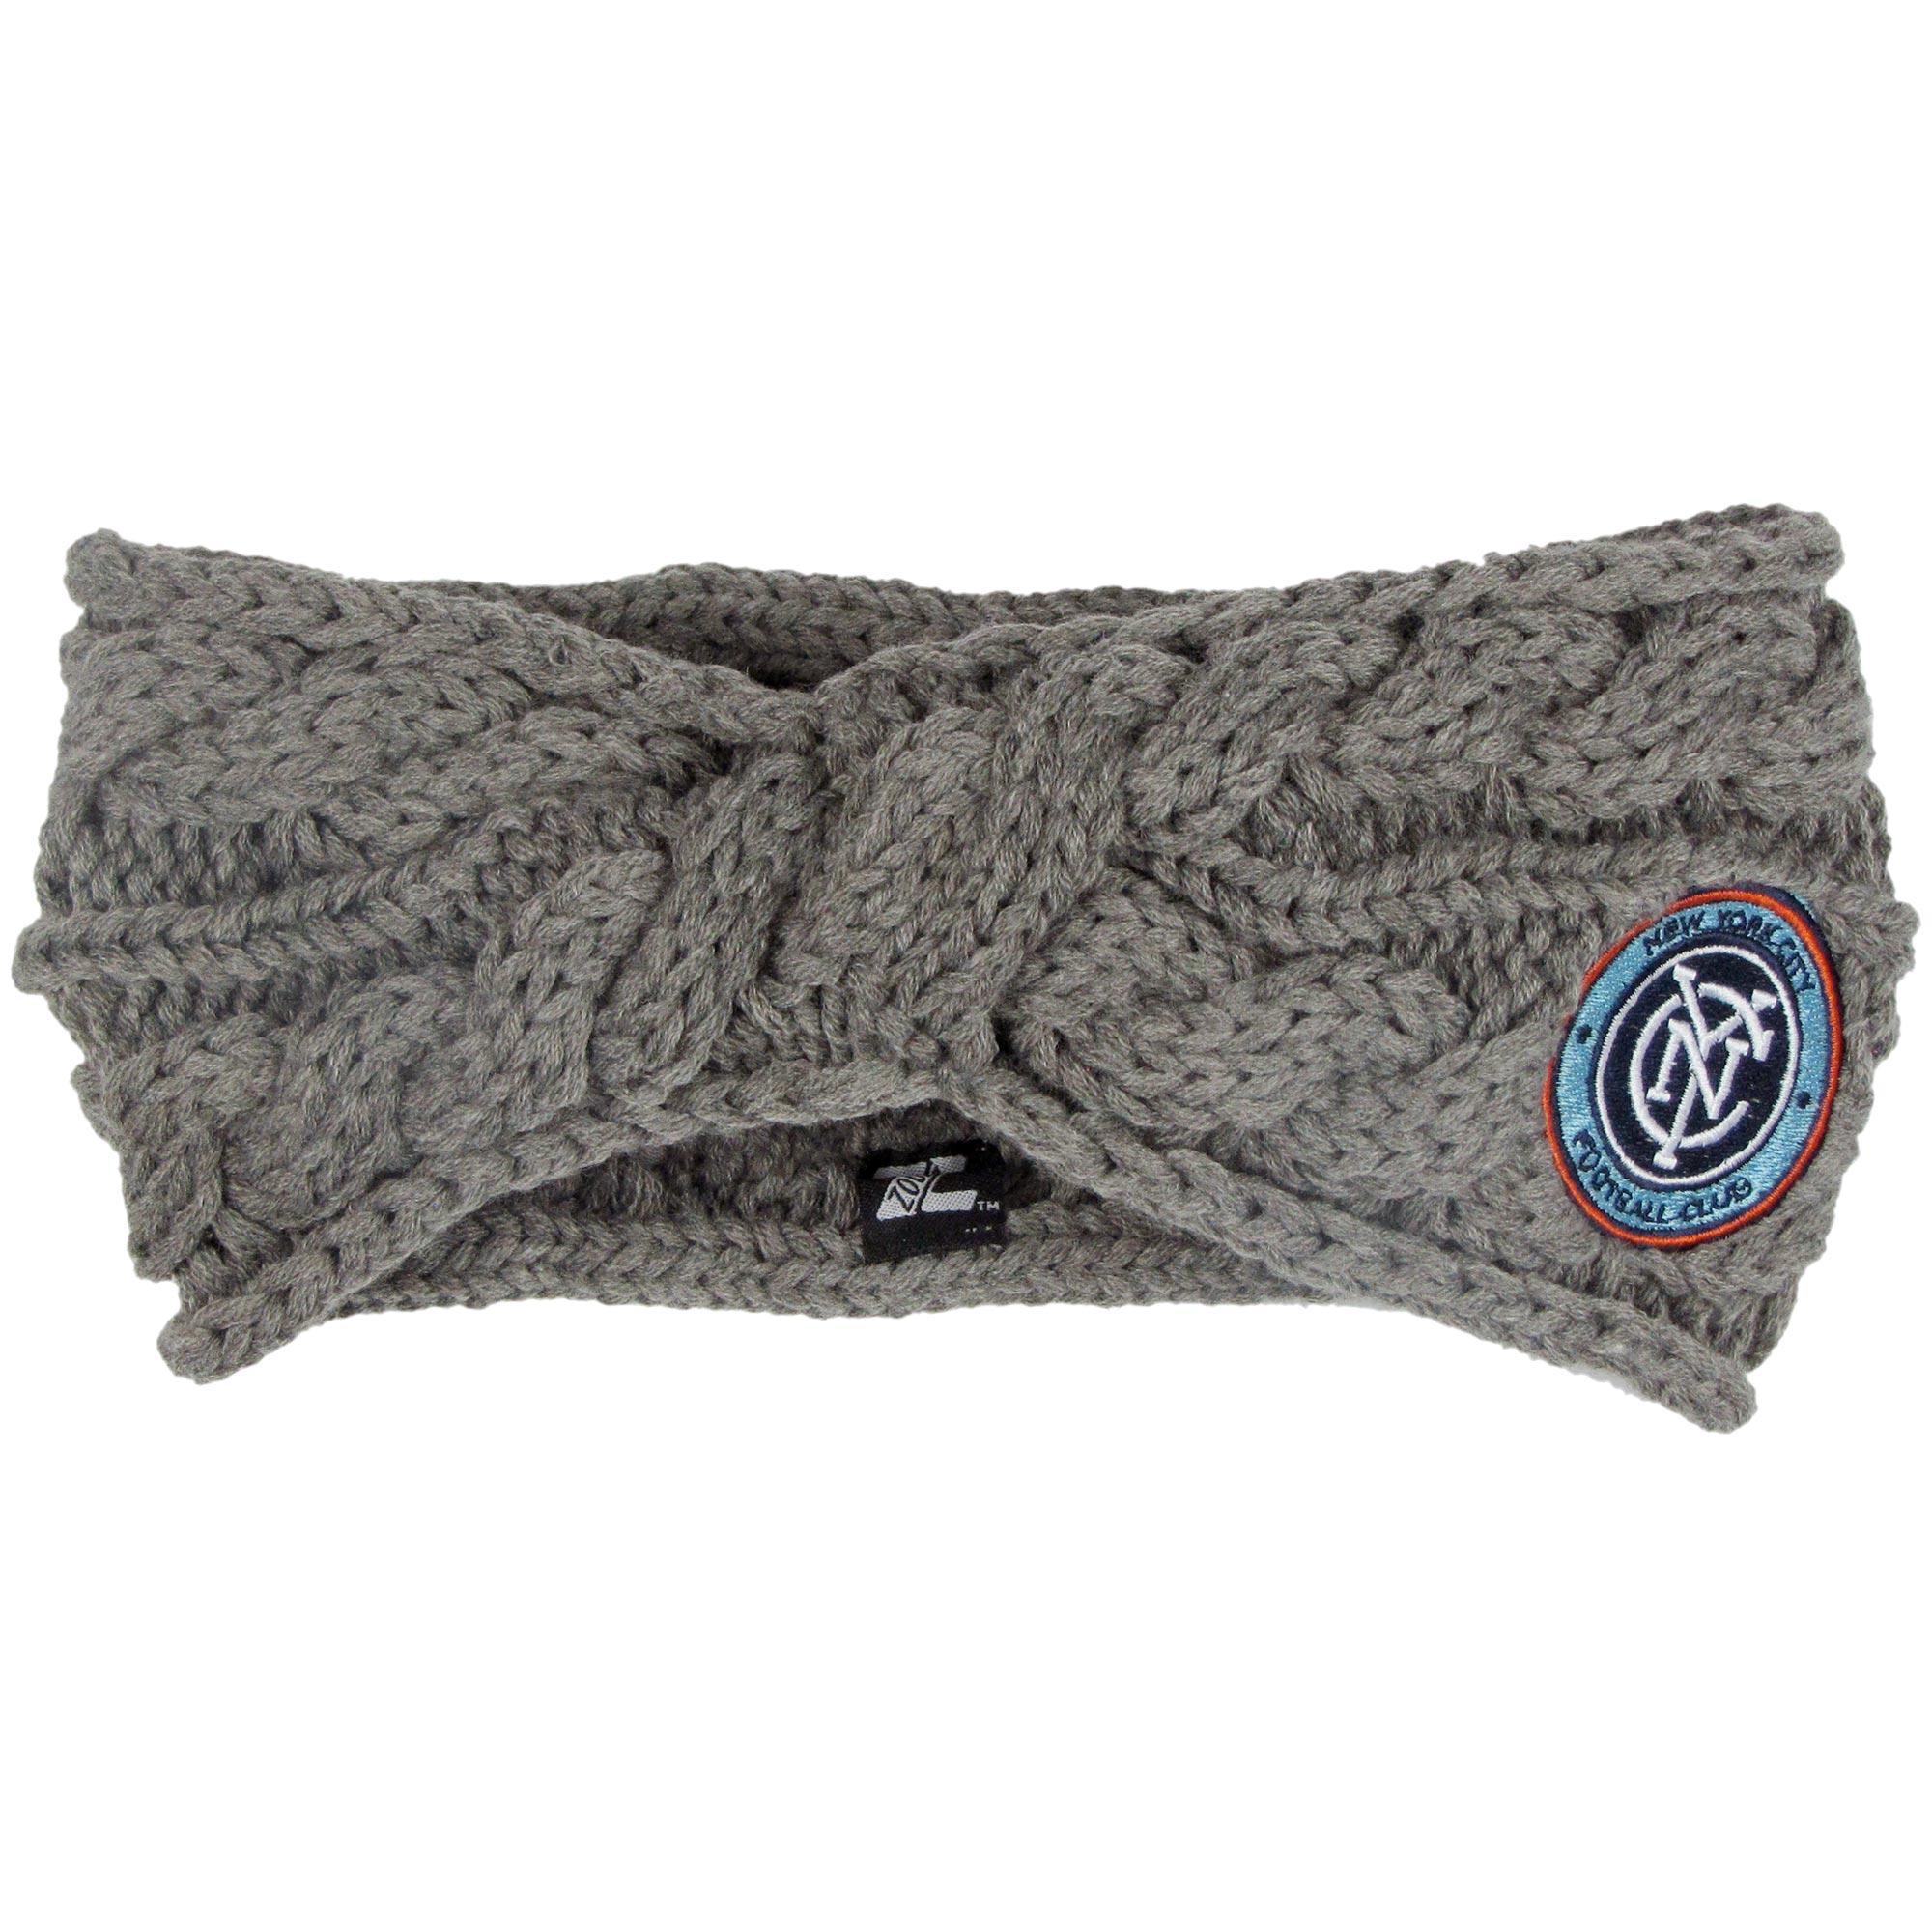 New York City FC ZooZatz Women's Cable Headband - Charcoal - No Size